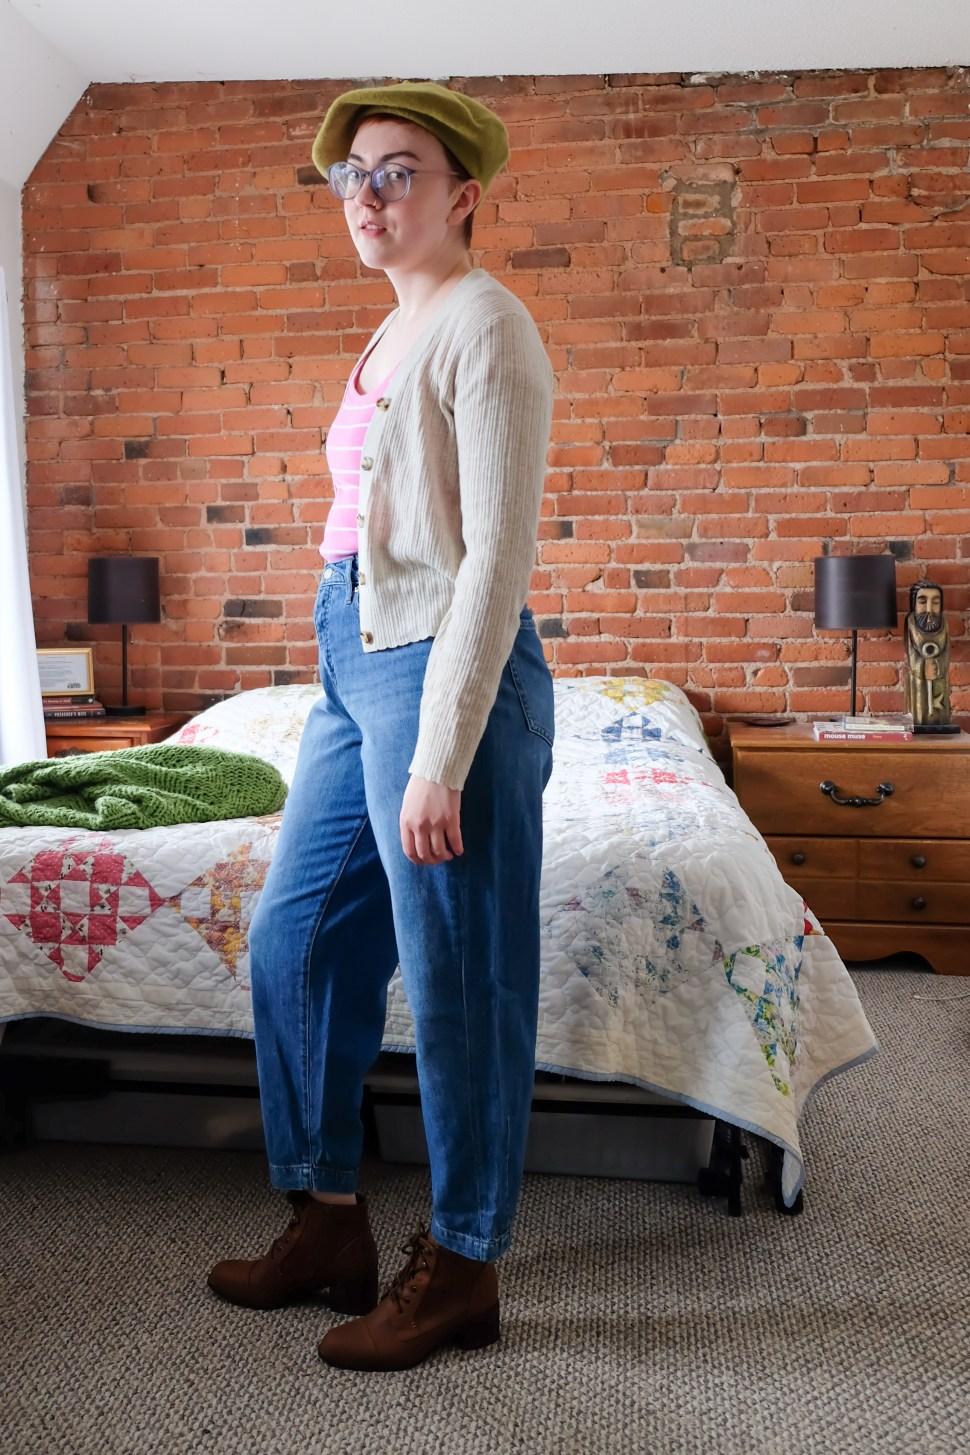 Barrel Jeans and Beret - curvy fit jeans